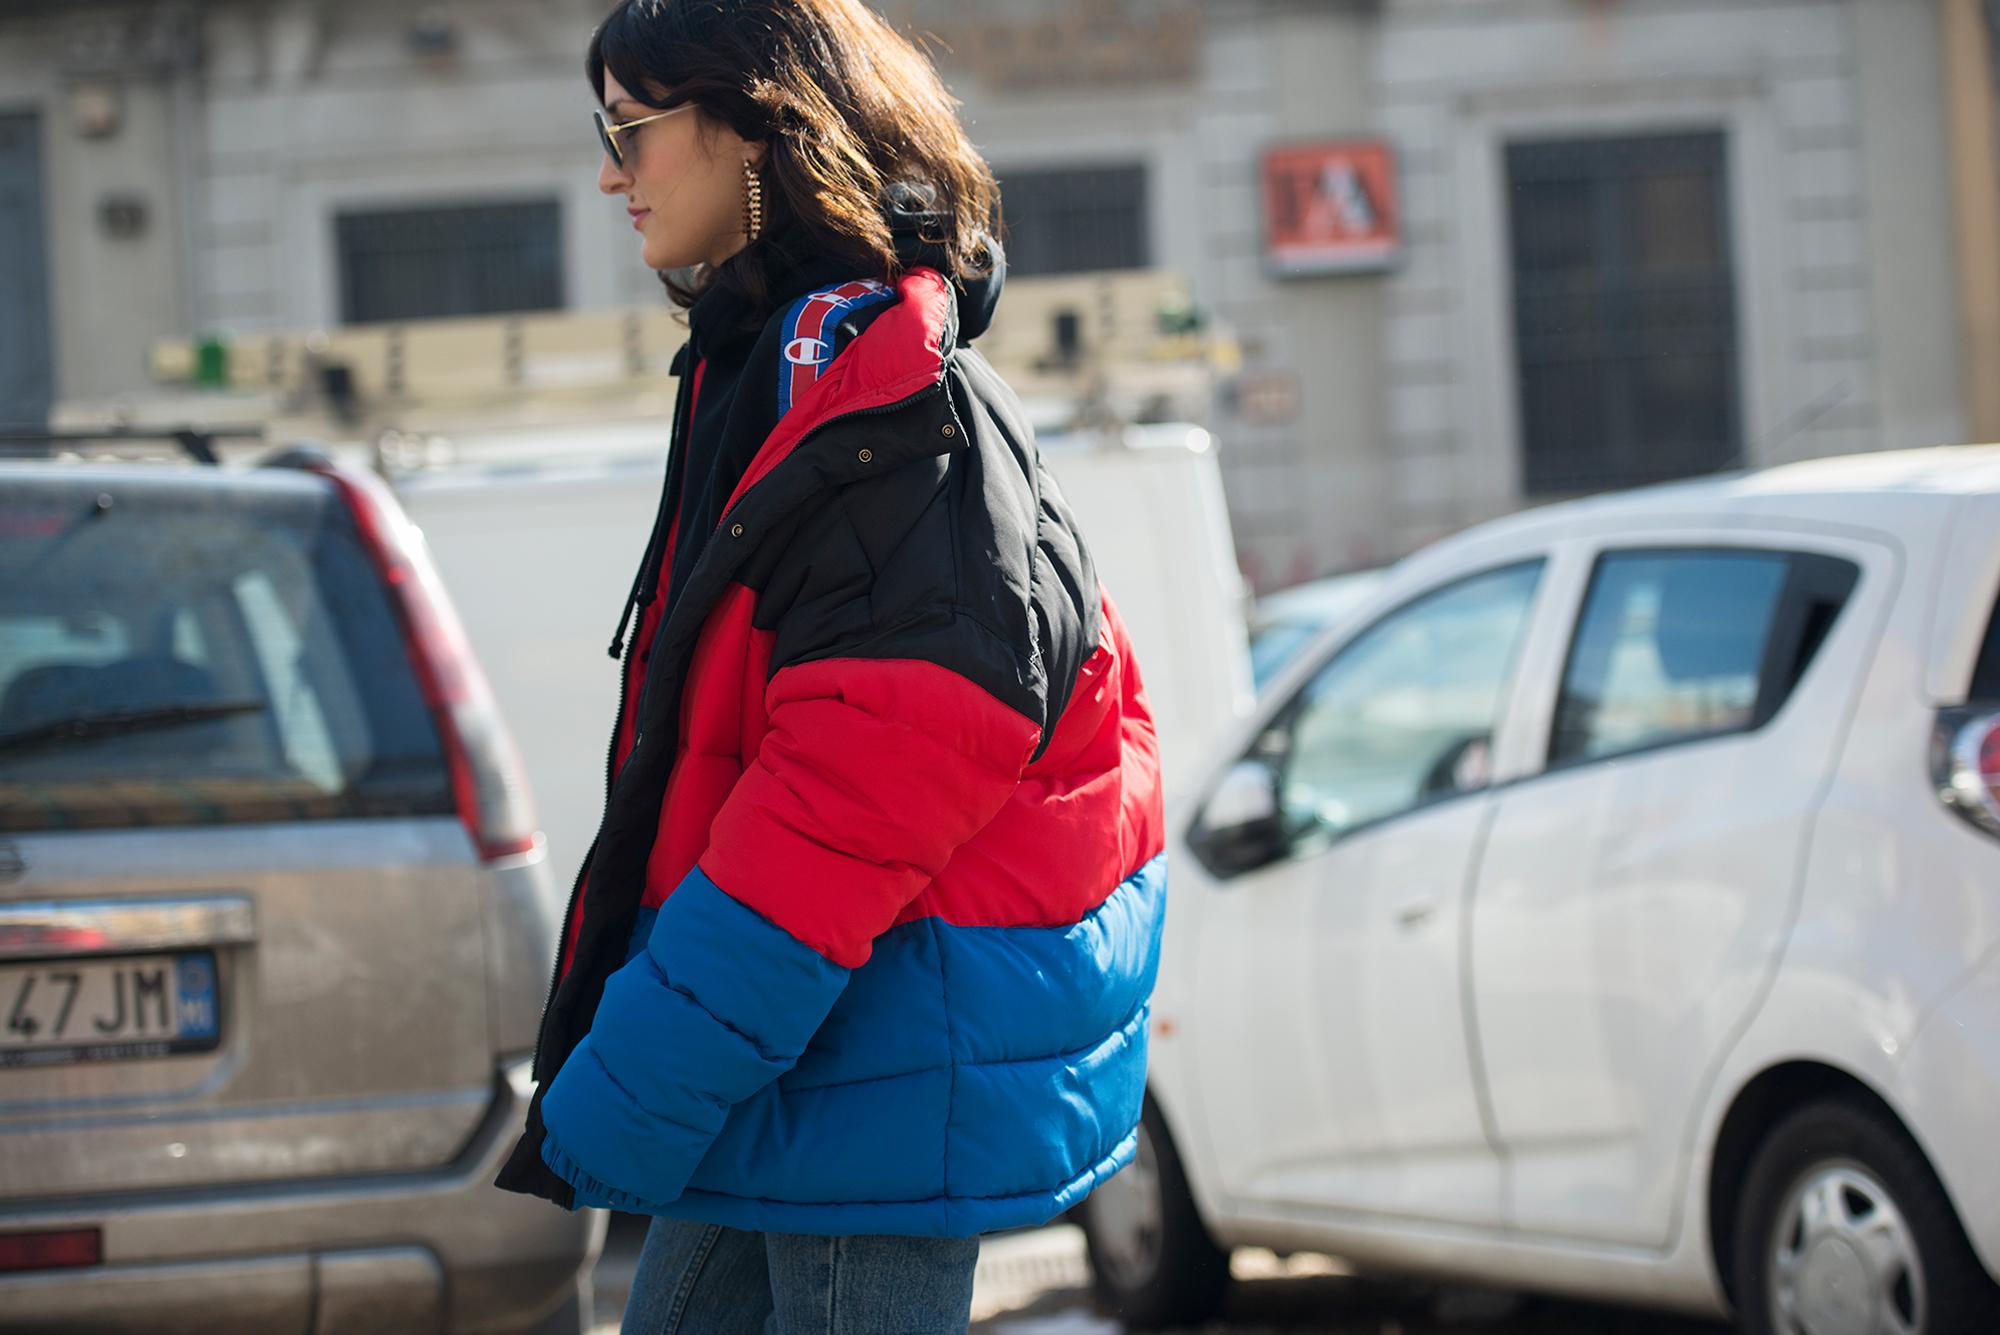 Streetsnaps Milan Fashion Week February 2017 - 3739920